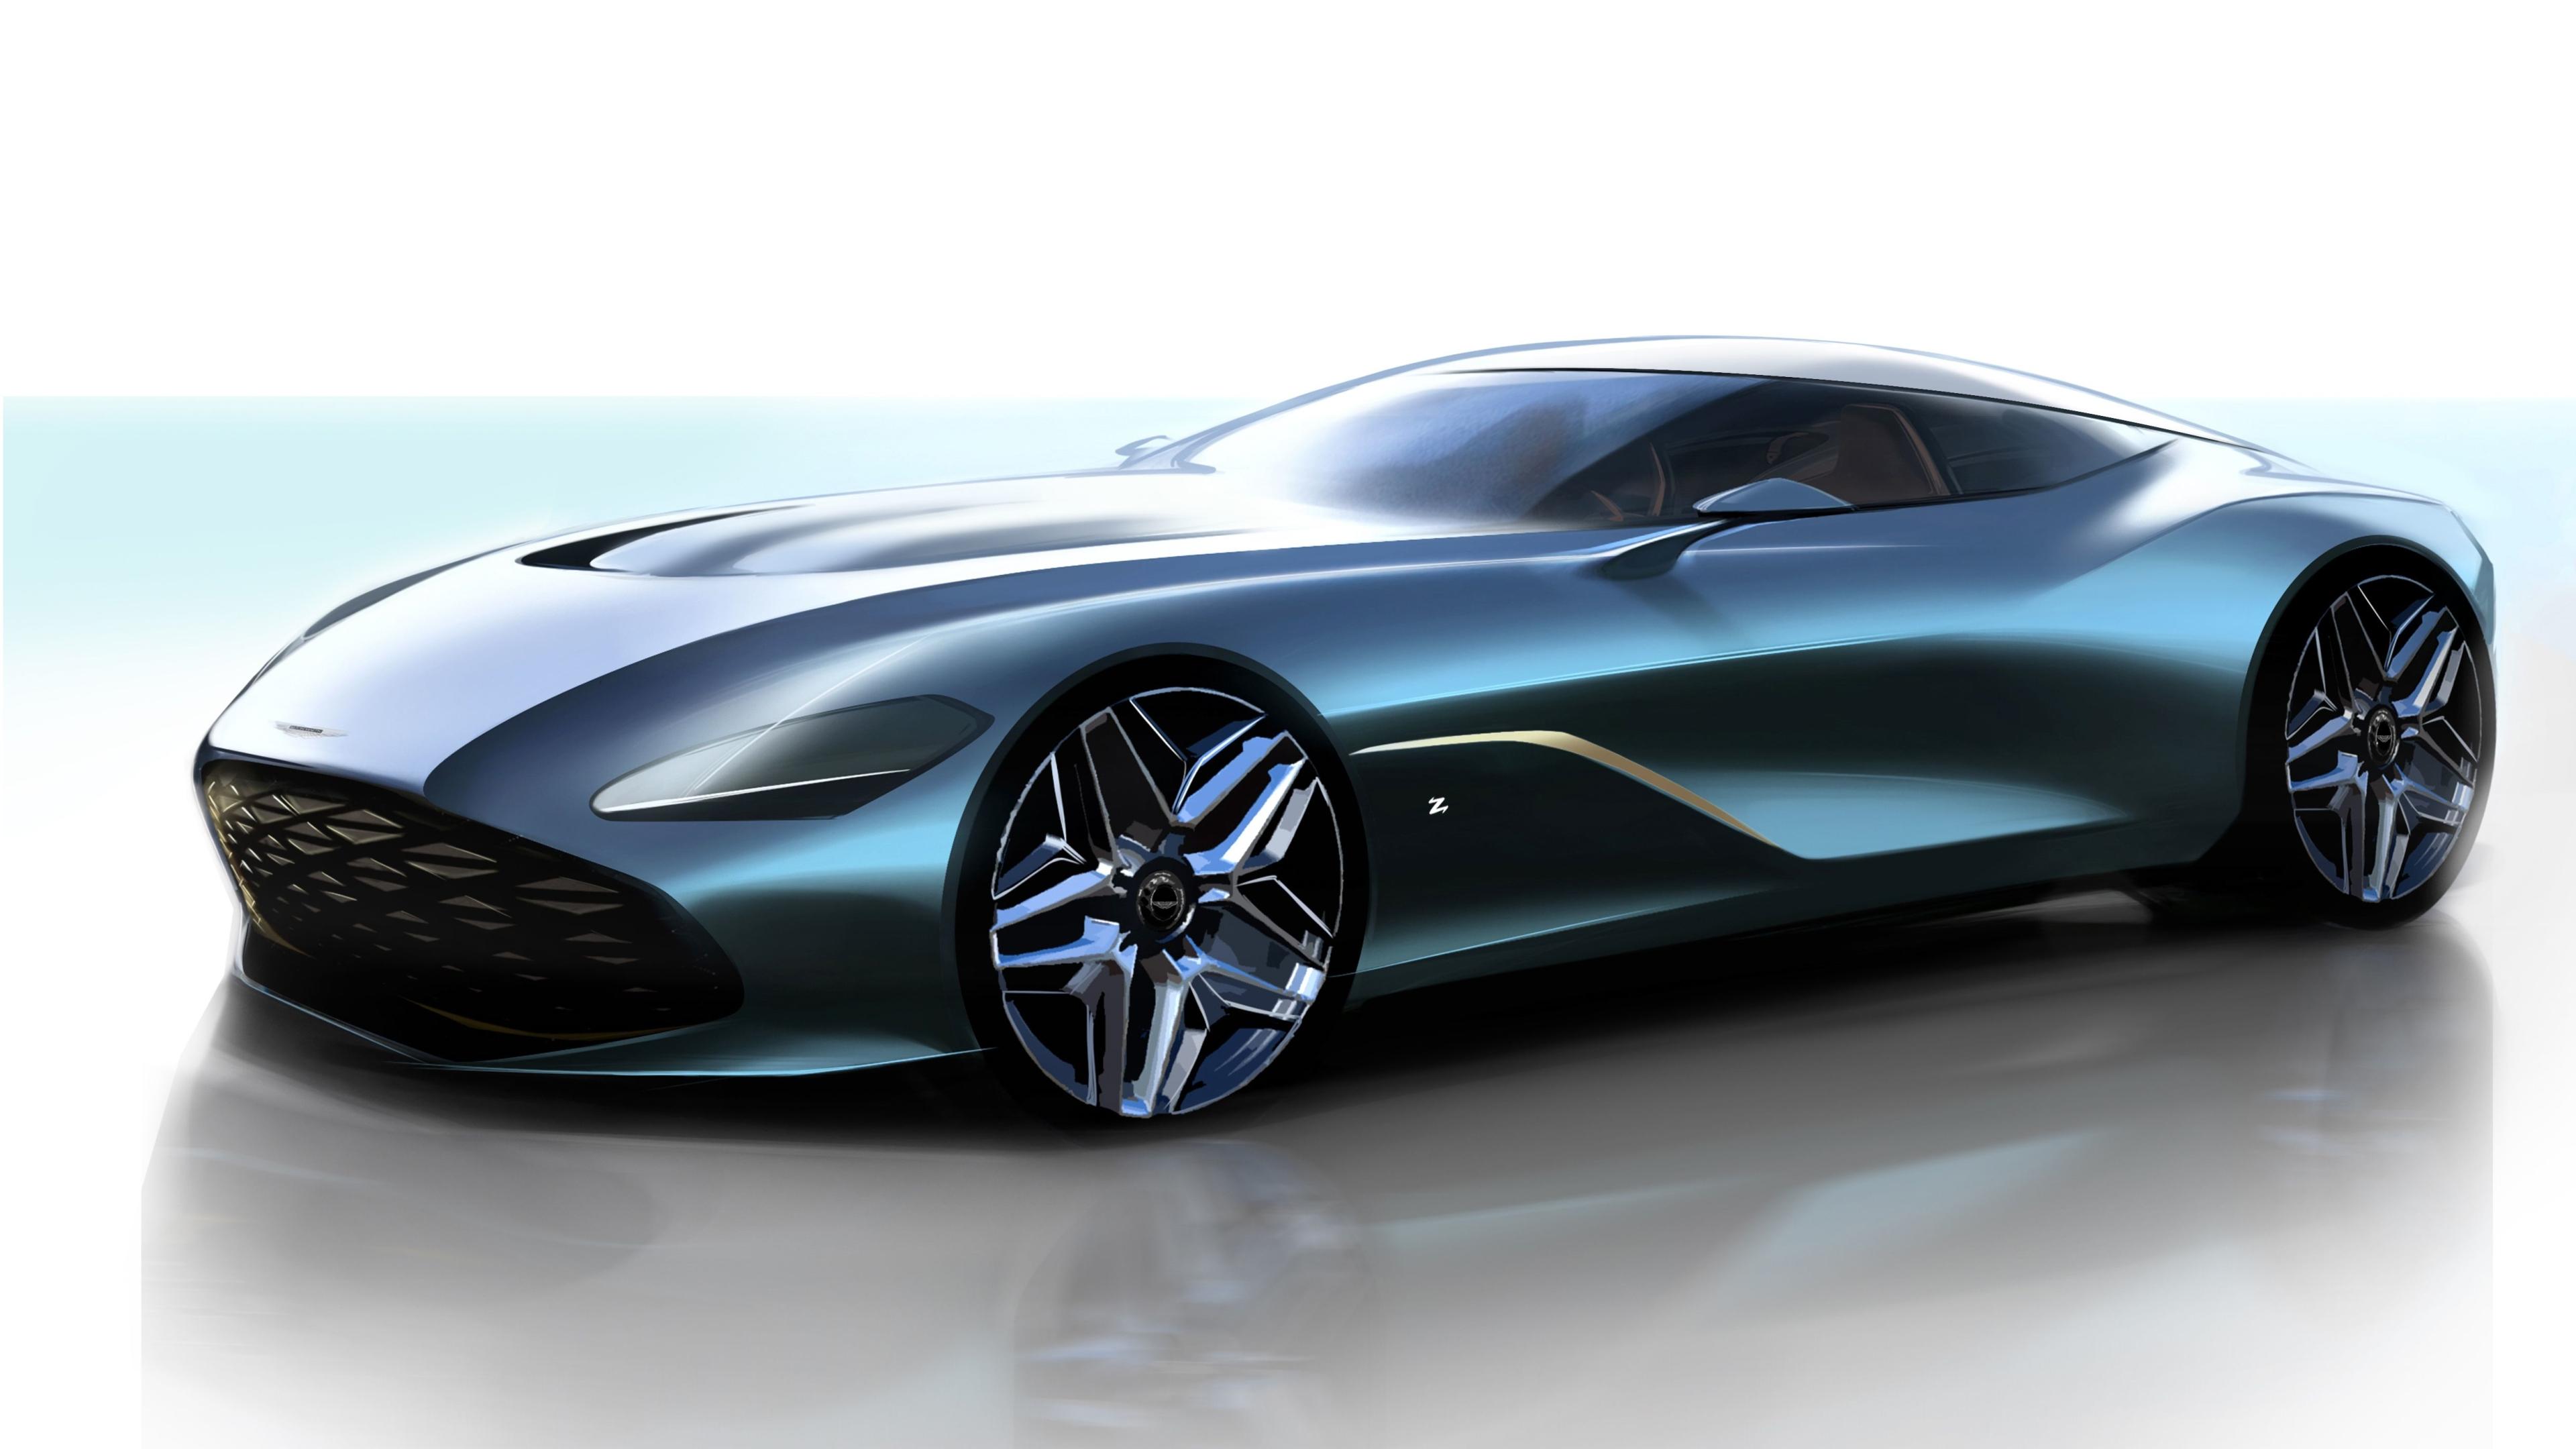 3840x2160 Aston Martin Dbs Gt Zagato 2019 4k Wallpaper Hd